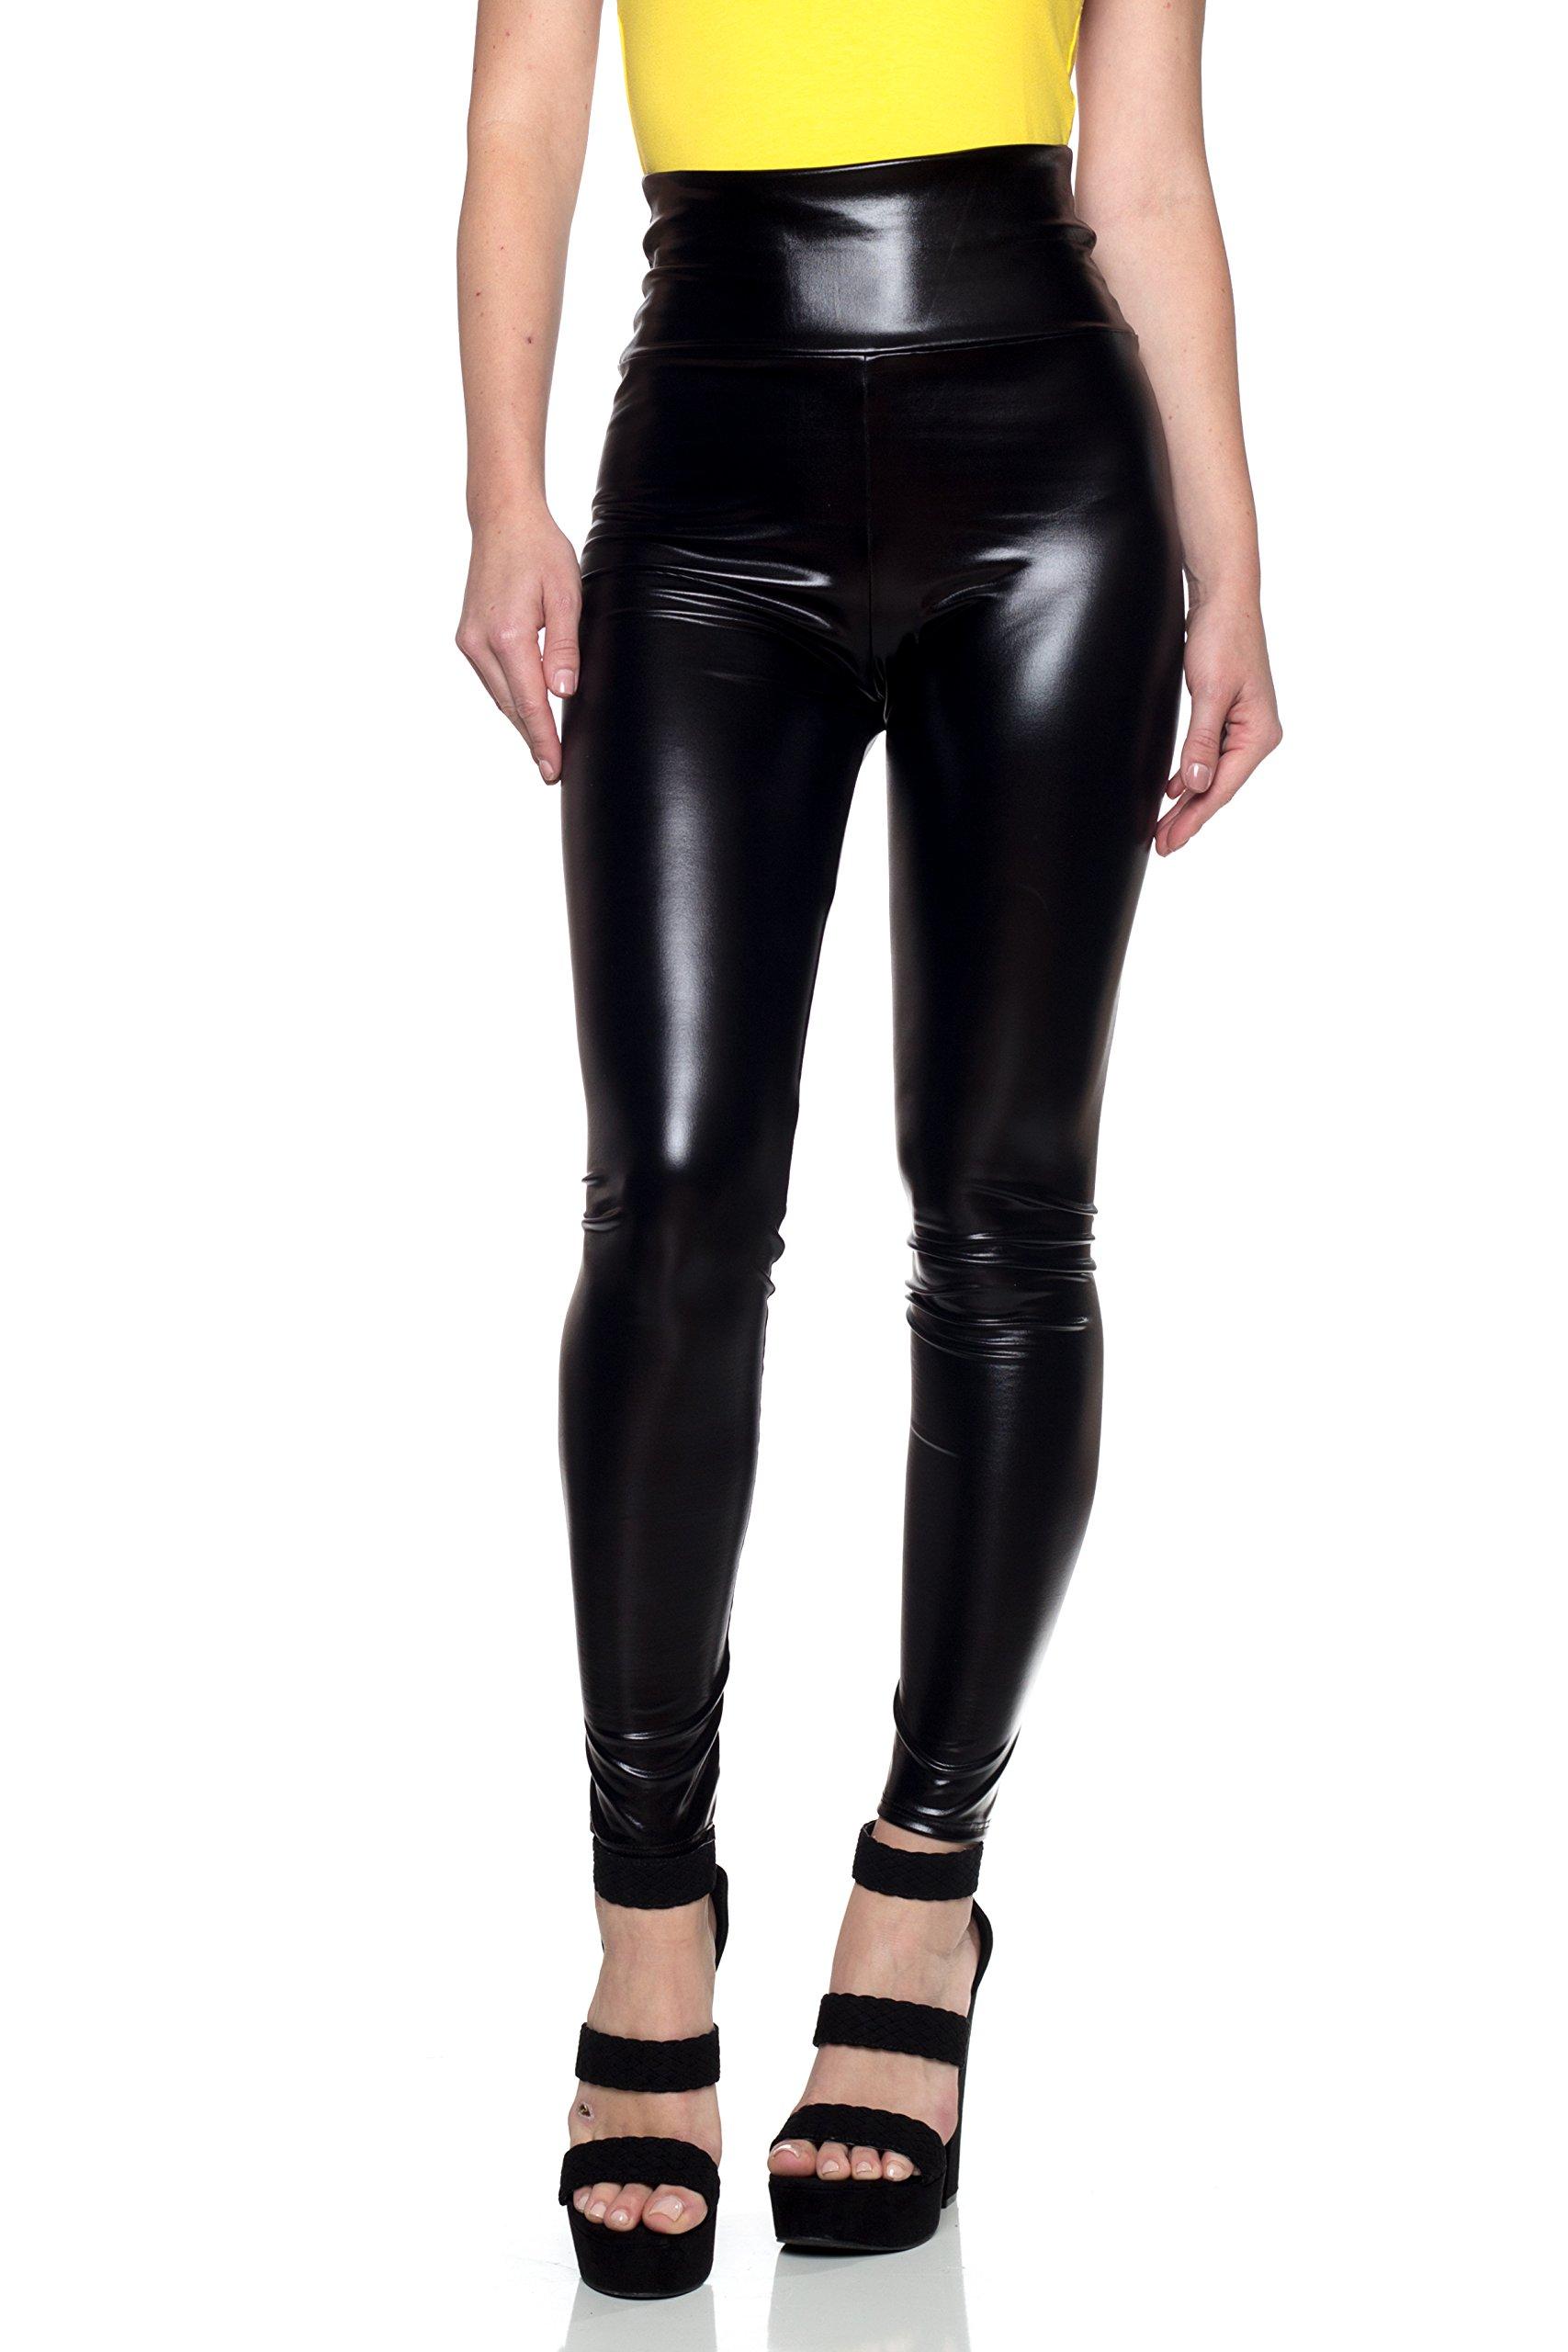 J2 Love Women's Junior Plus Faux Leather High Waist Leggings, 2X, Metallic Black